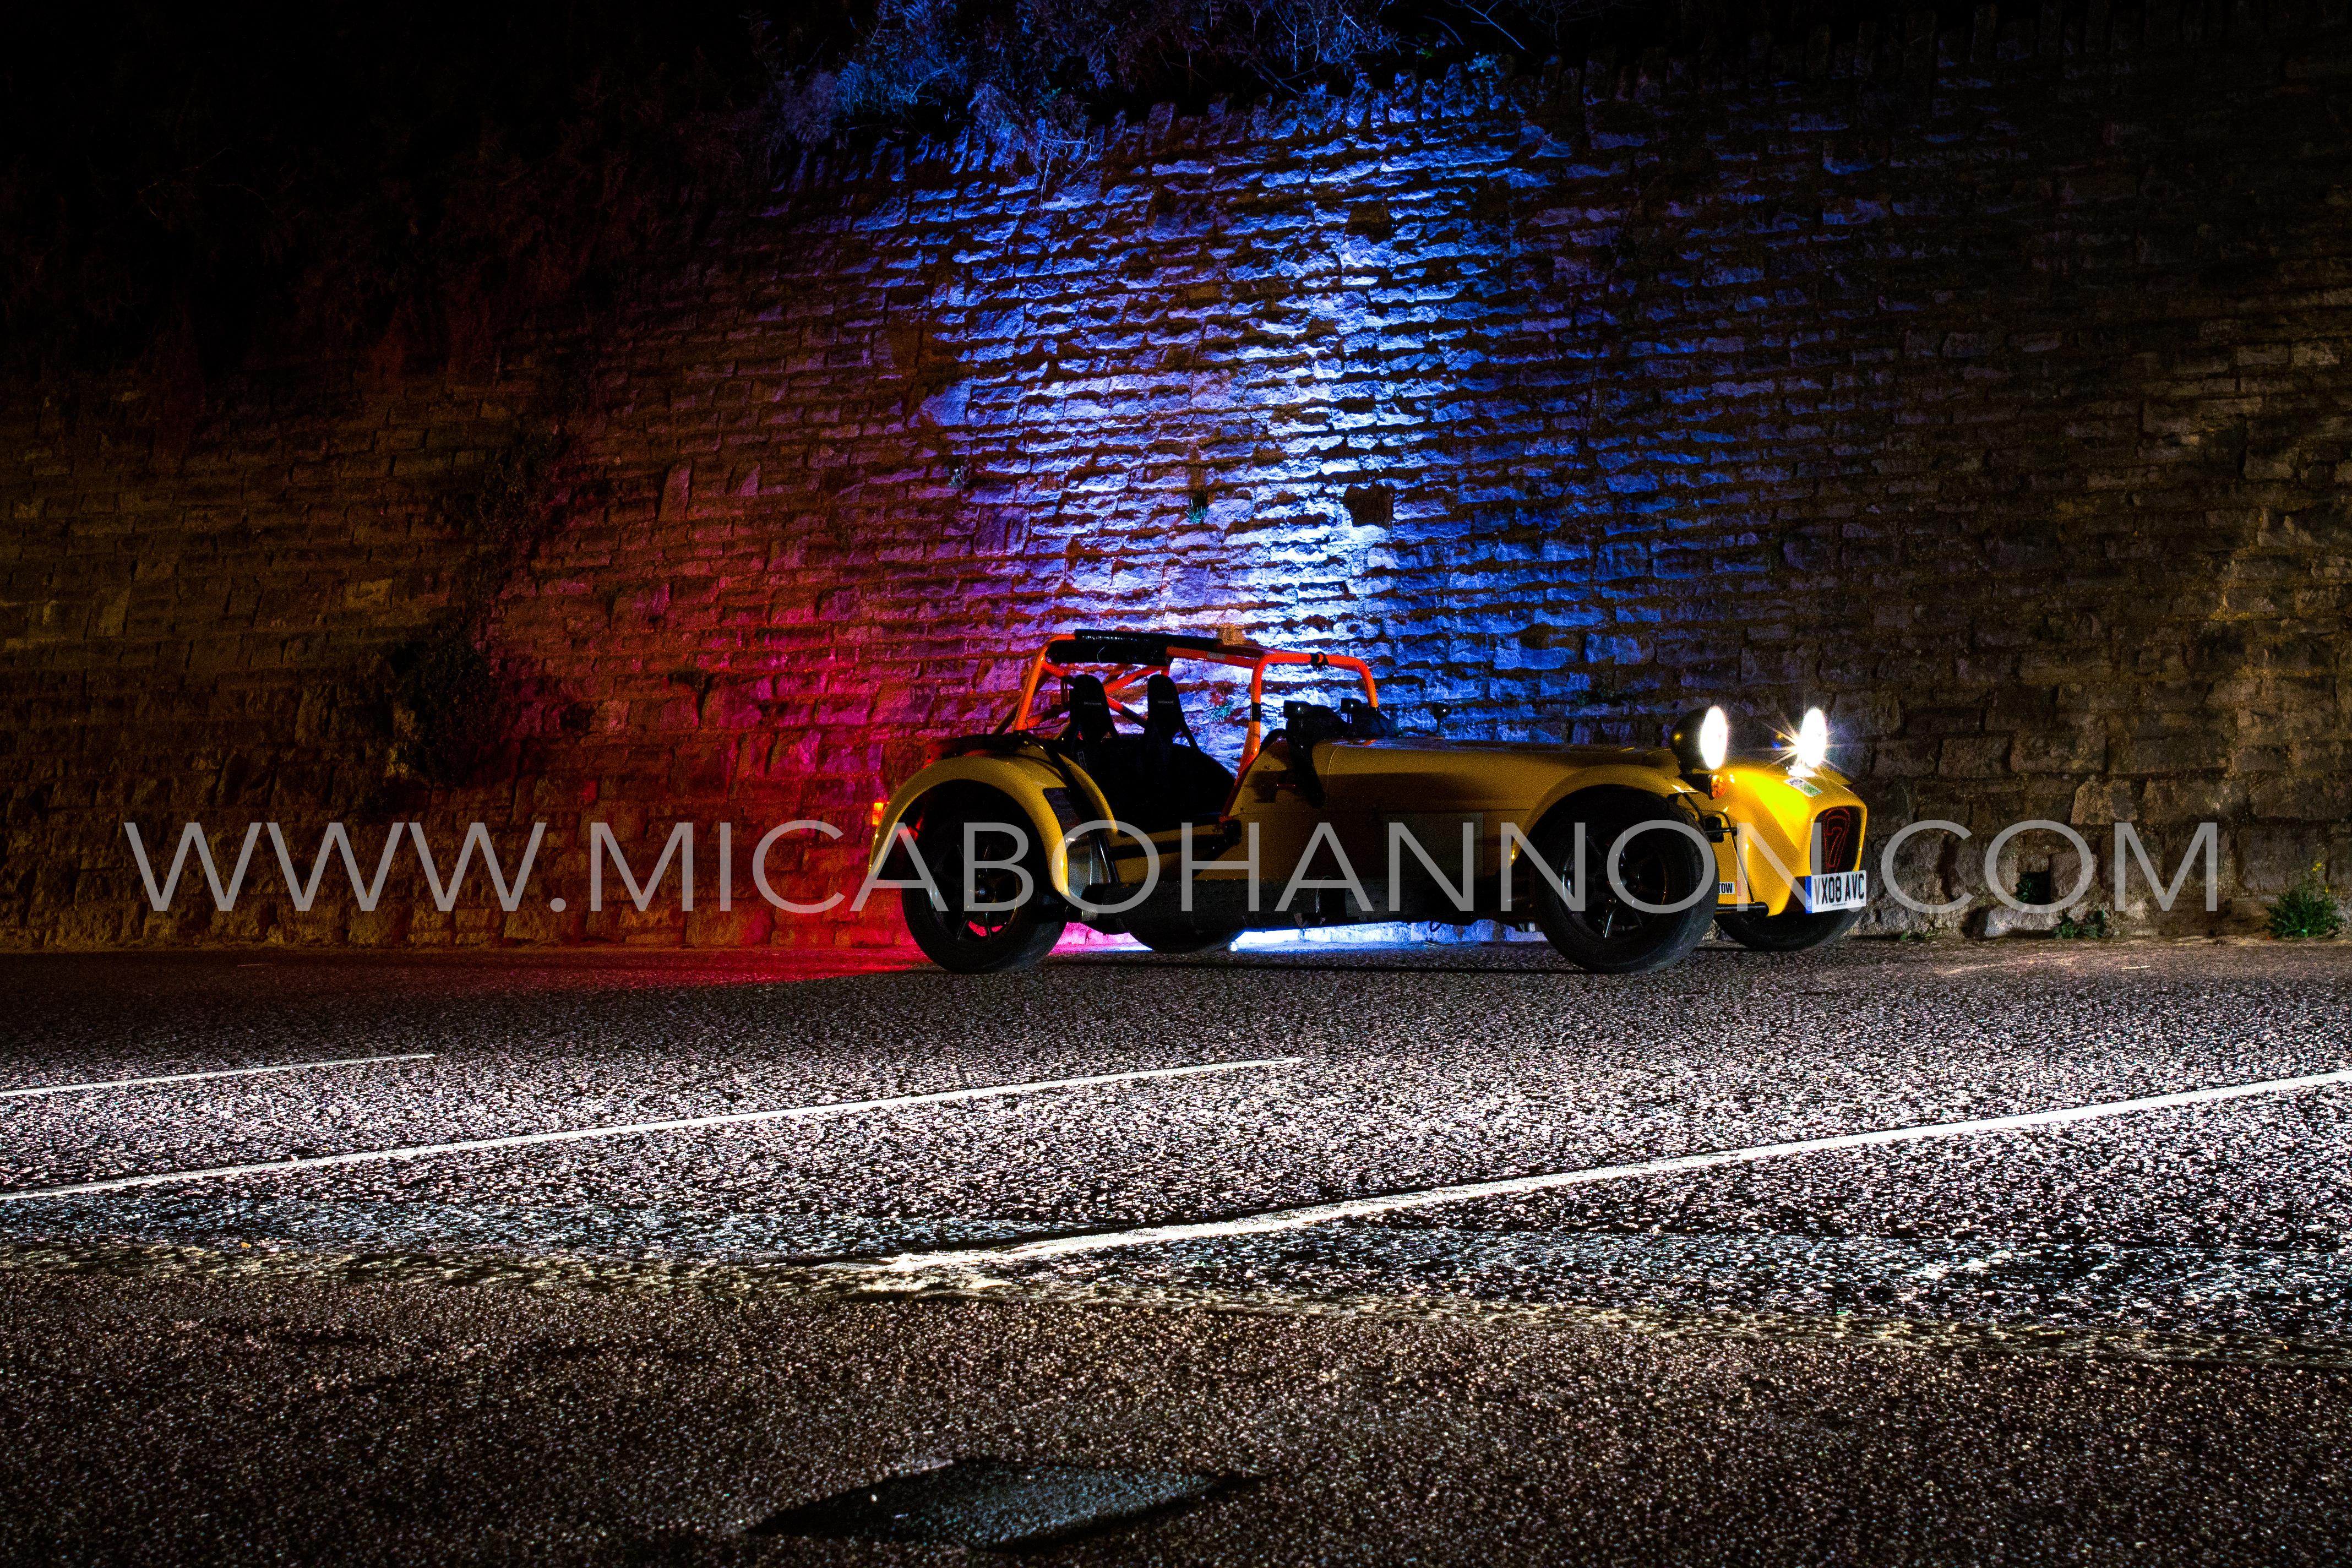 night photography of caterham